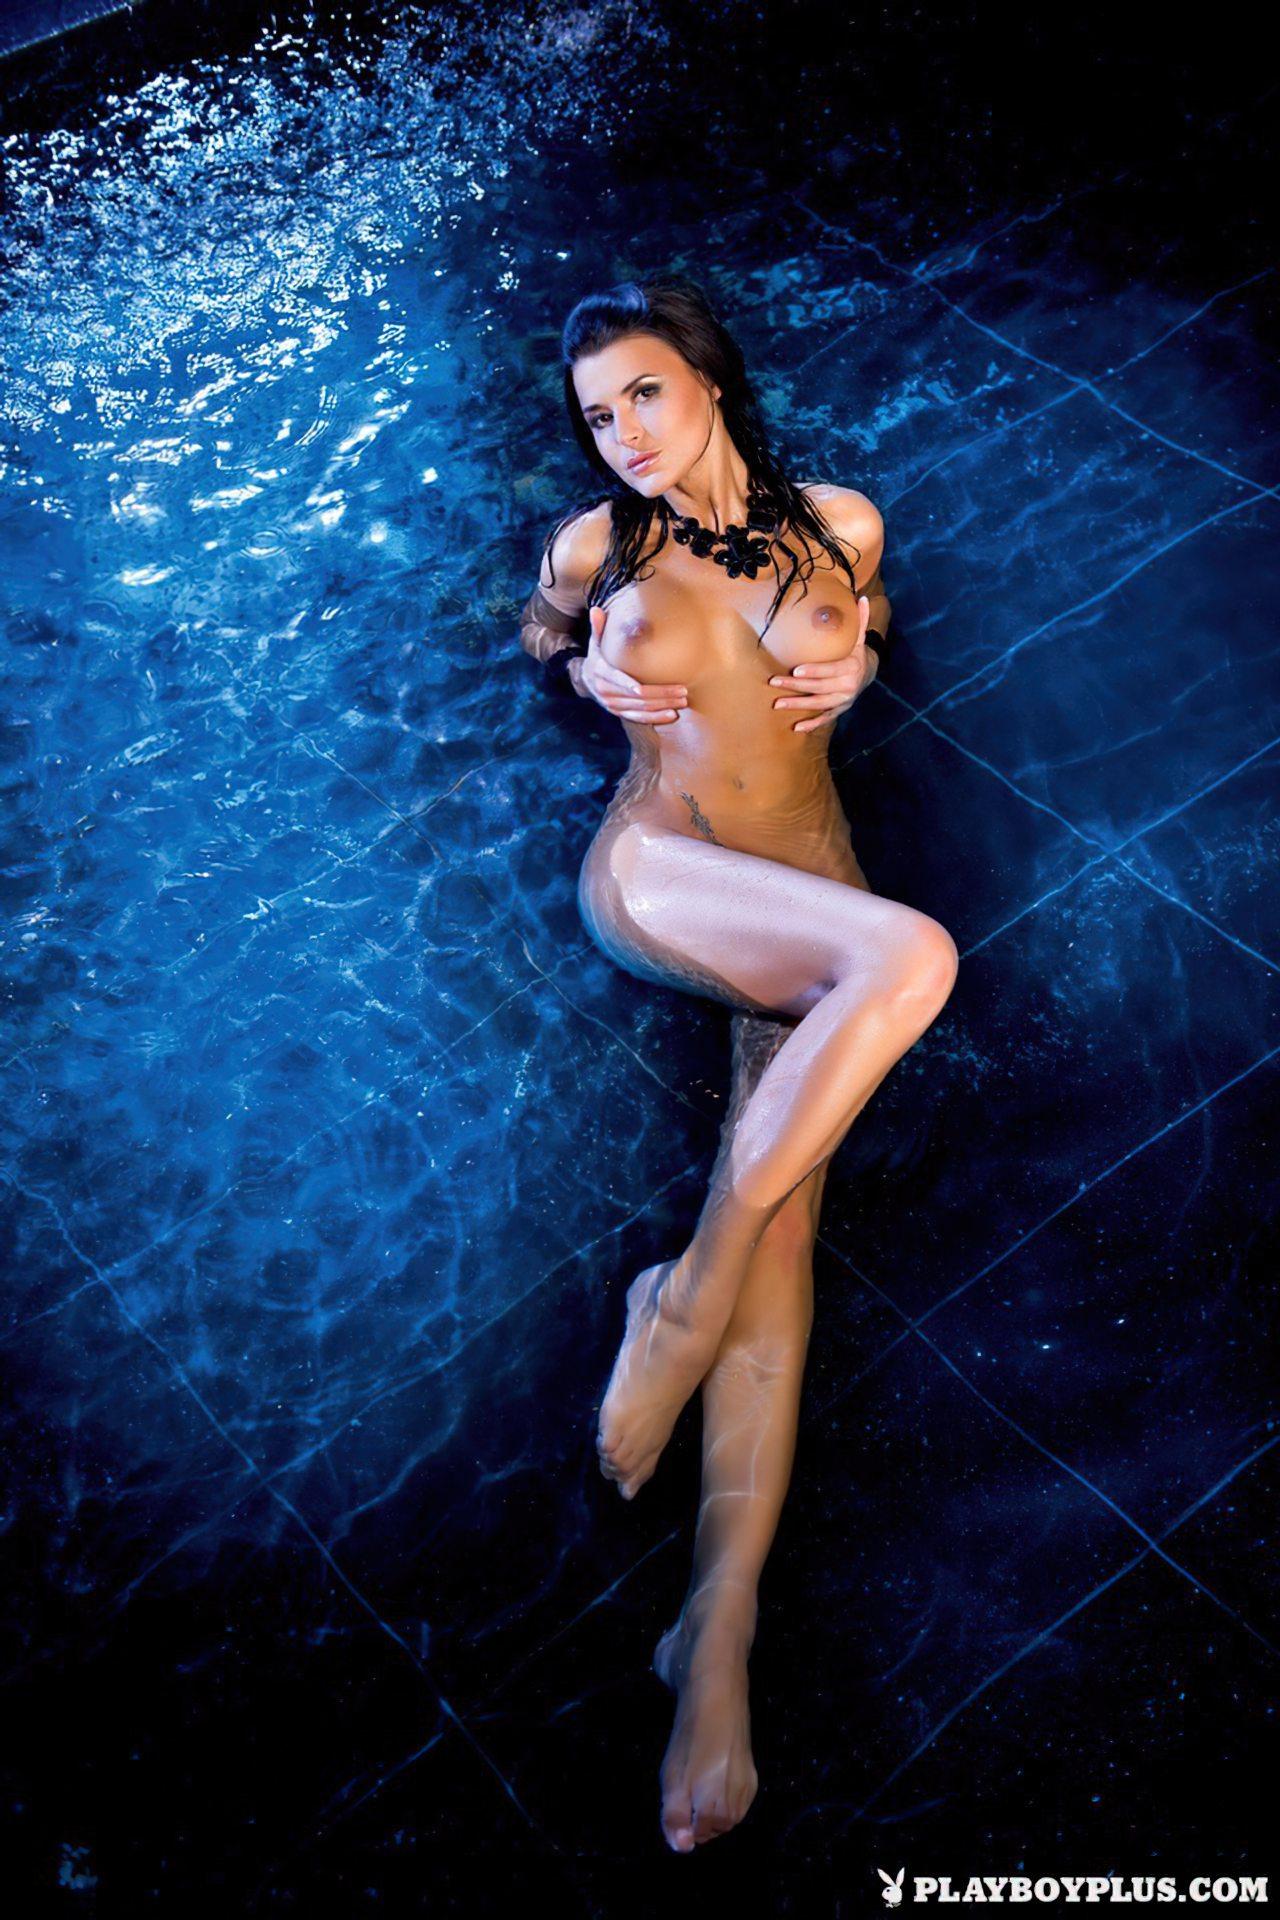 Oxana Bondarenko Playboy (1)